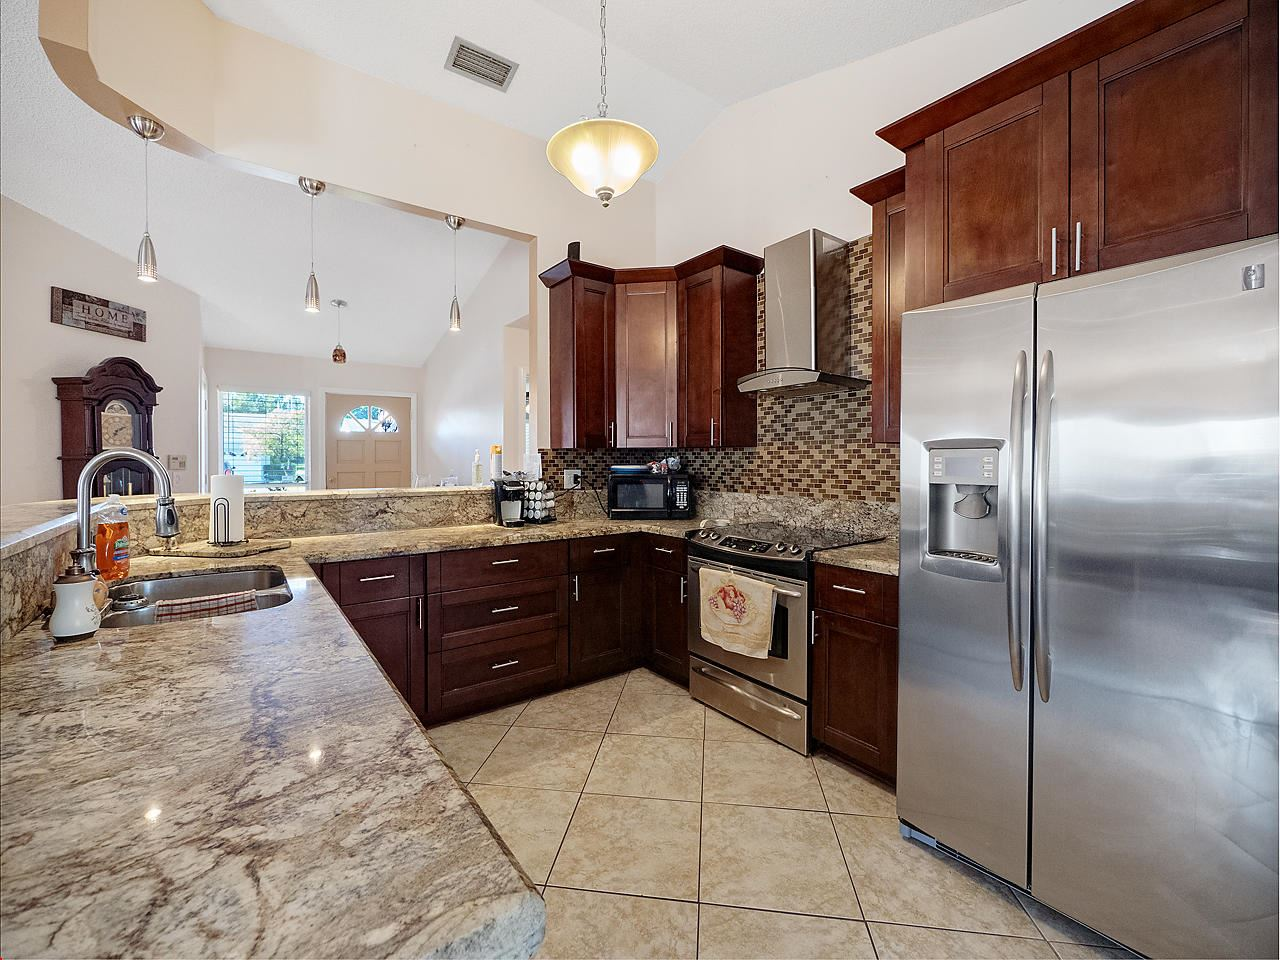 9846 Goldenrod Drive, Boynton Beach, FL 33437 - #: RX-10614536